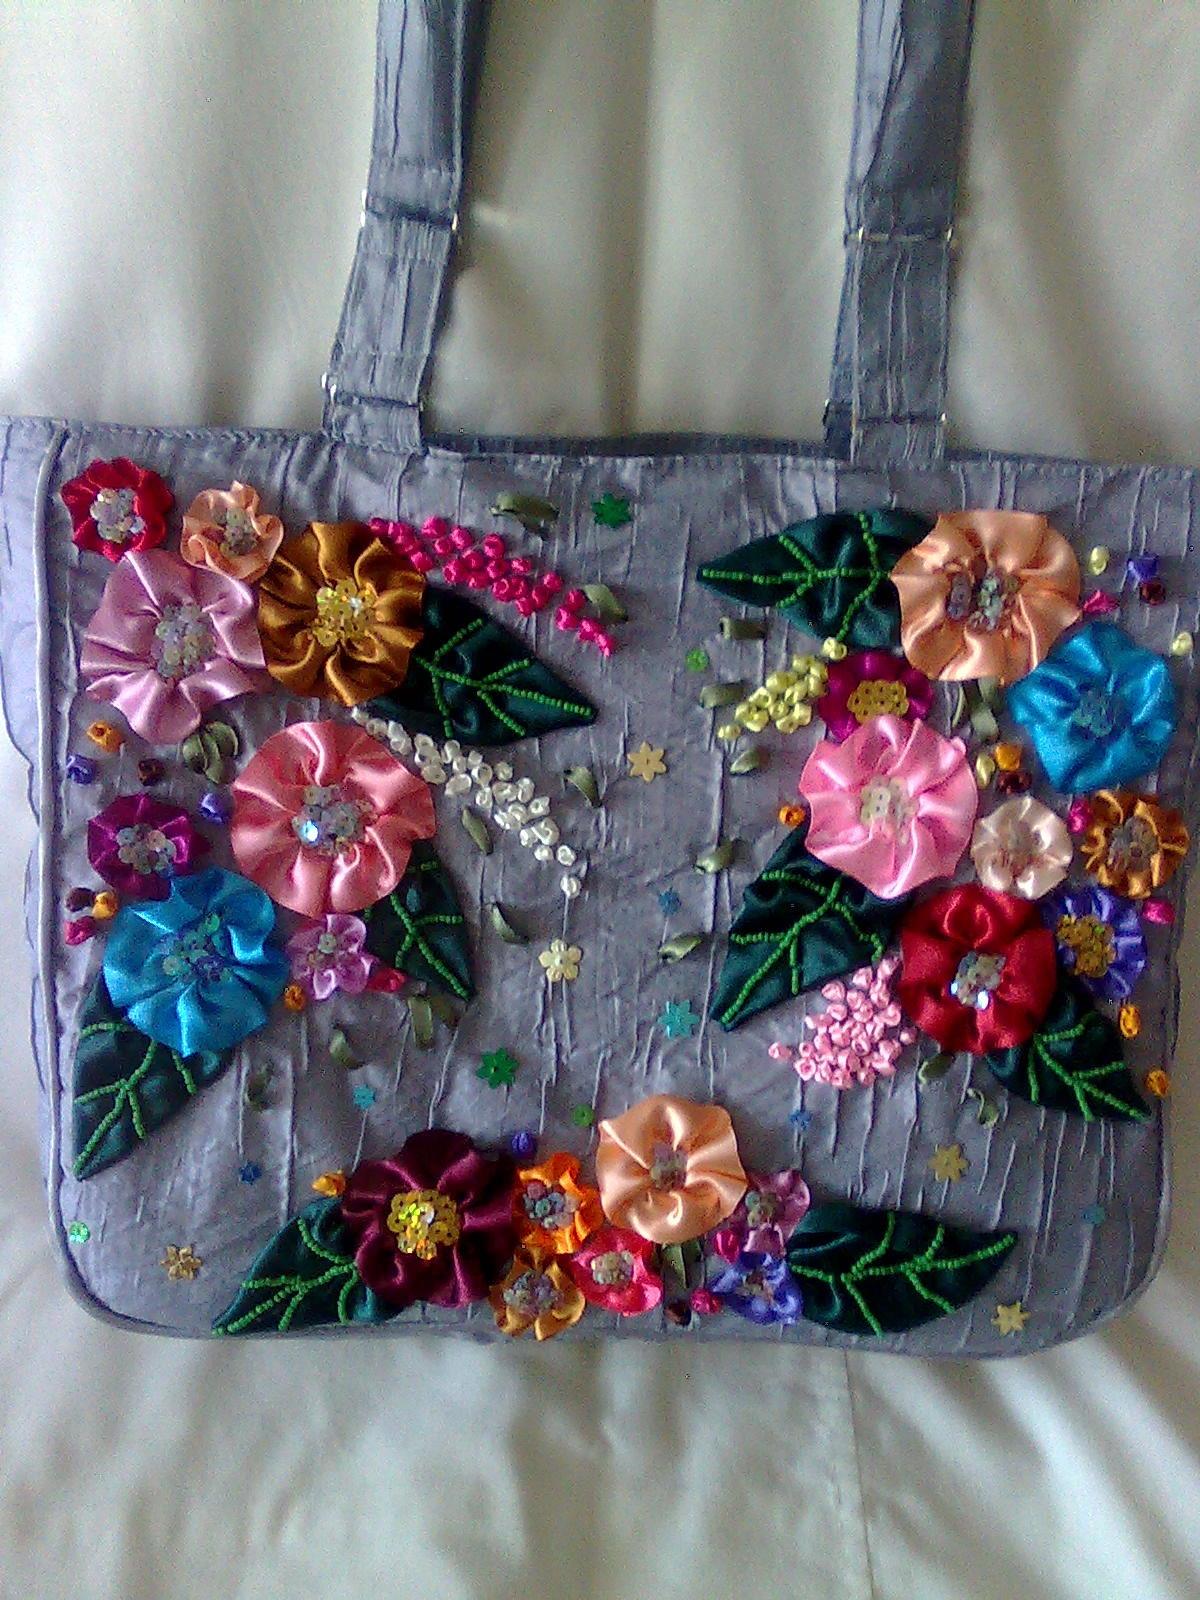 Вышивка лентами сумочка